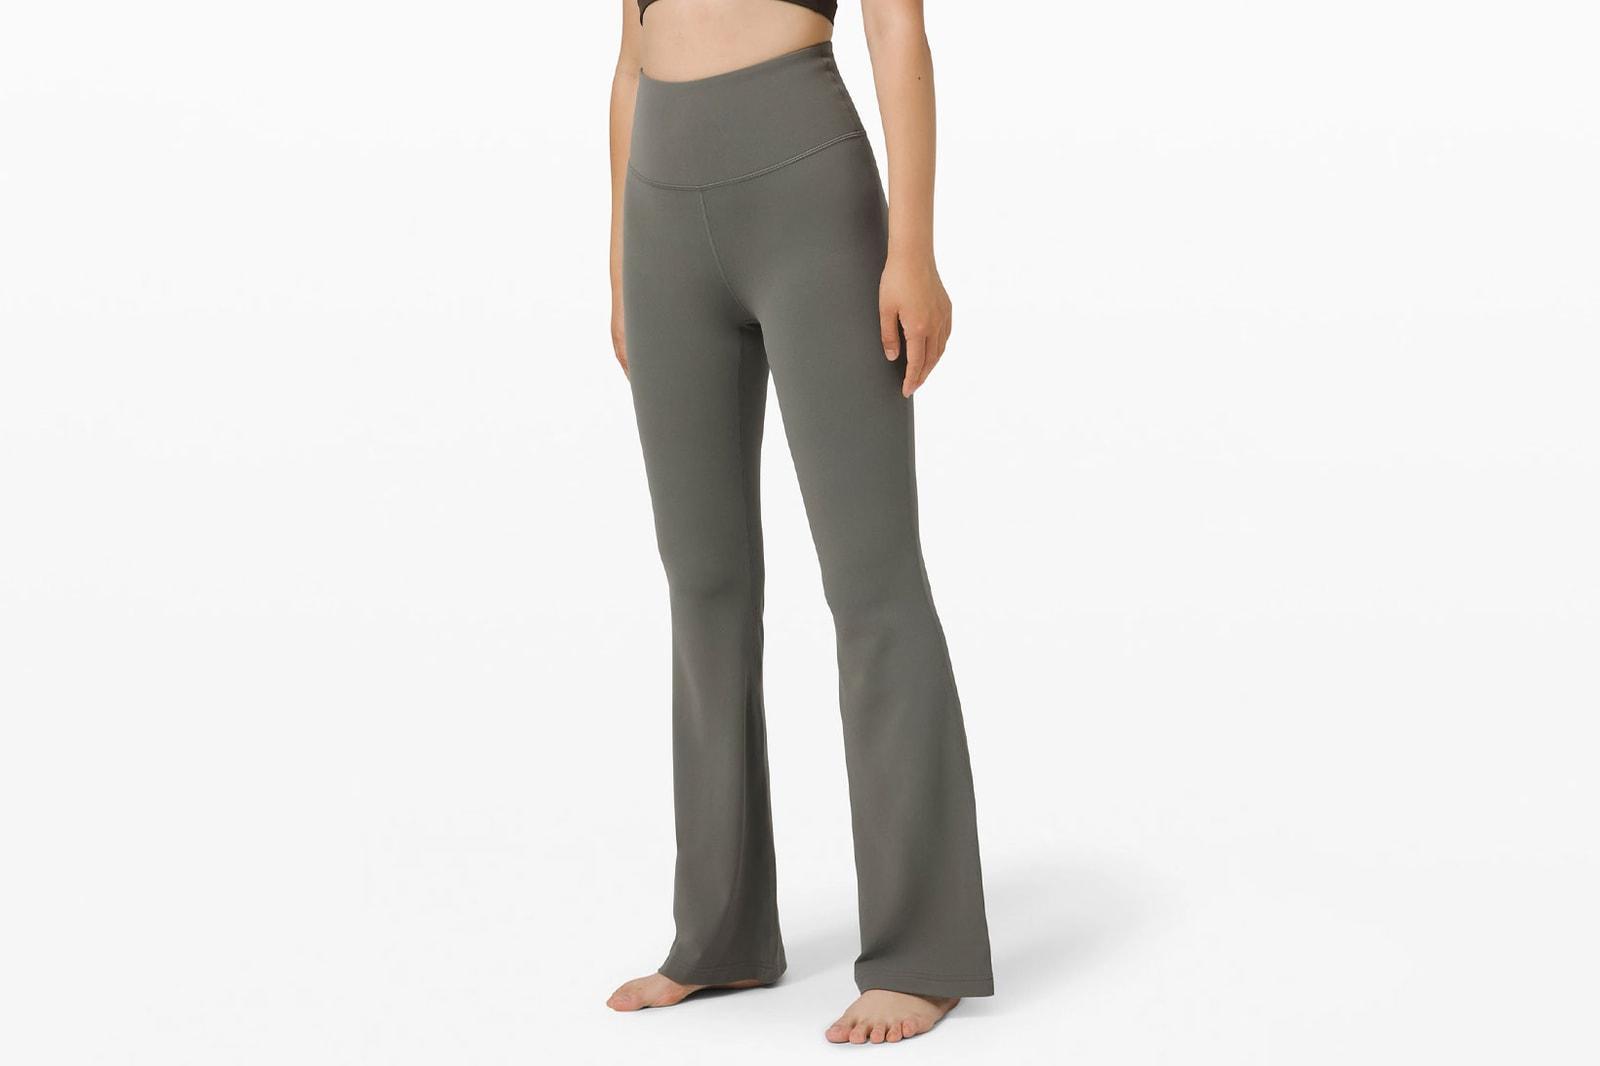 best flared leggings yoga pants trend tiktok gen z lululemon nike live the process